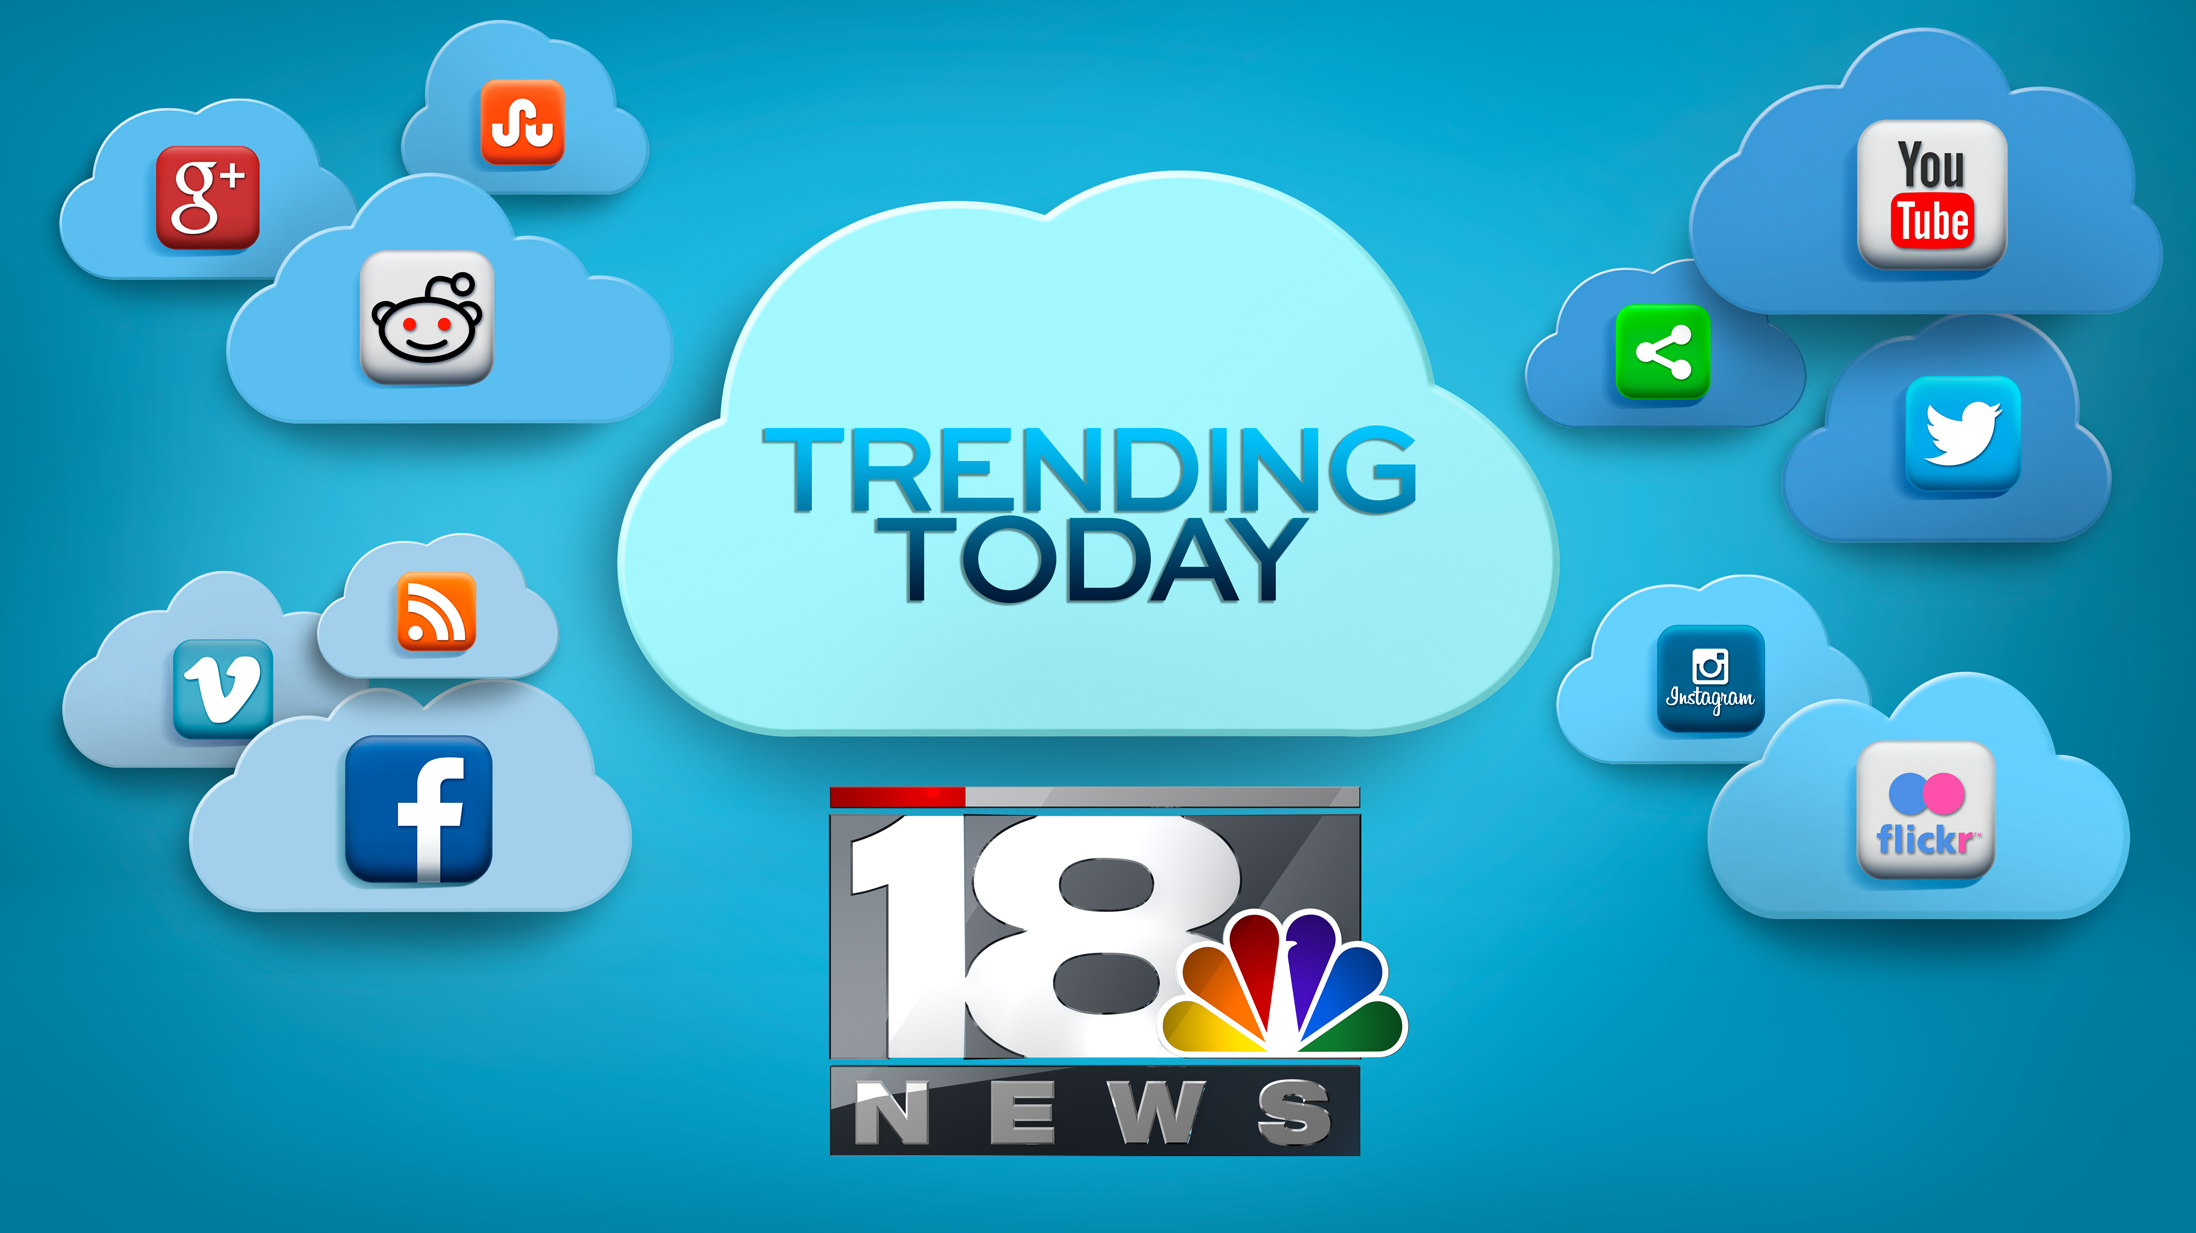 Trending Today_1453333910146.jpg